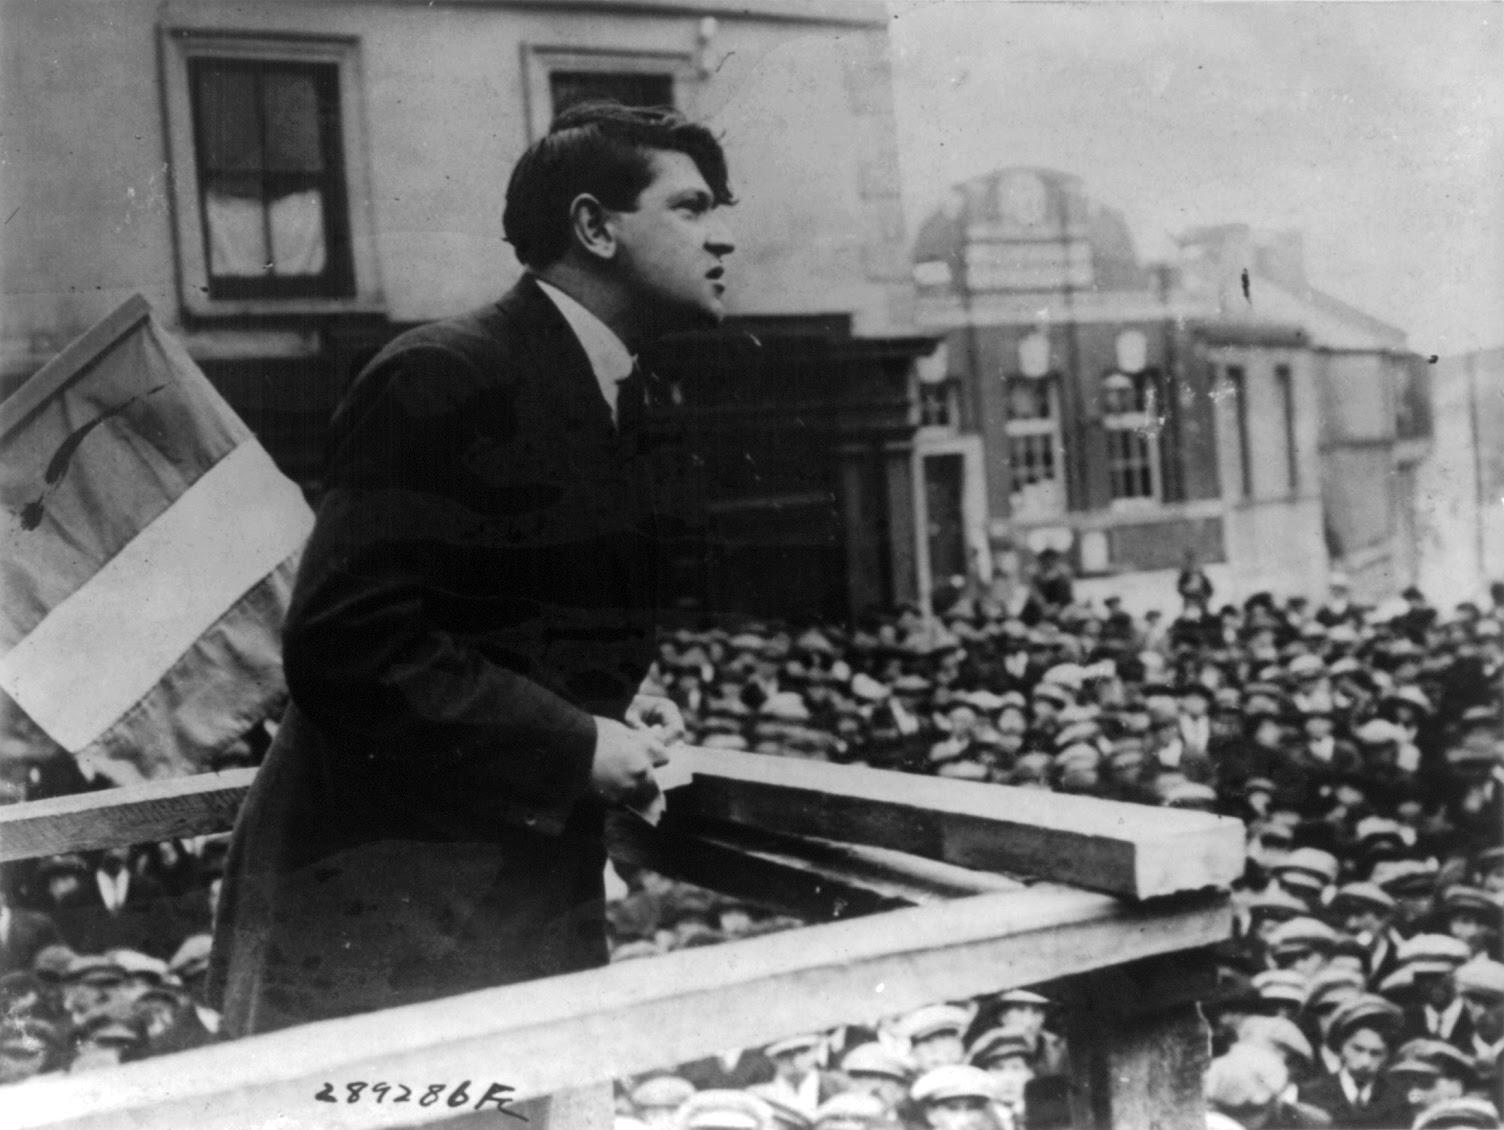 http://upload.wikimedia.org/wikipedia/commons/b/b1/Michael_Collins_addressing_crowd_in_Cork_cph.3b15295.jpg